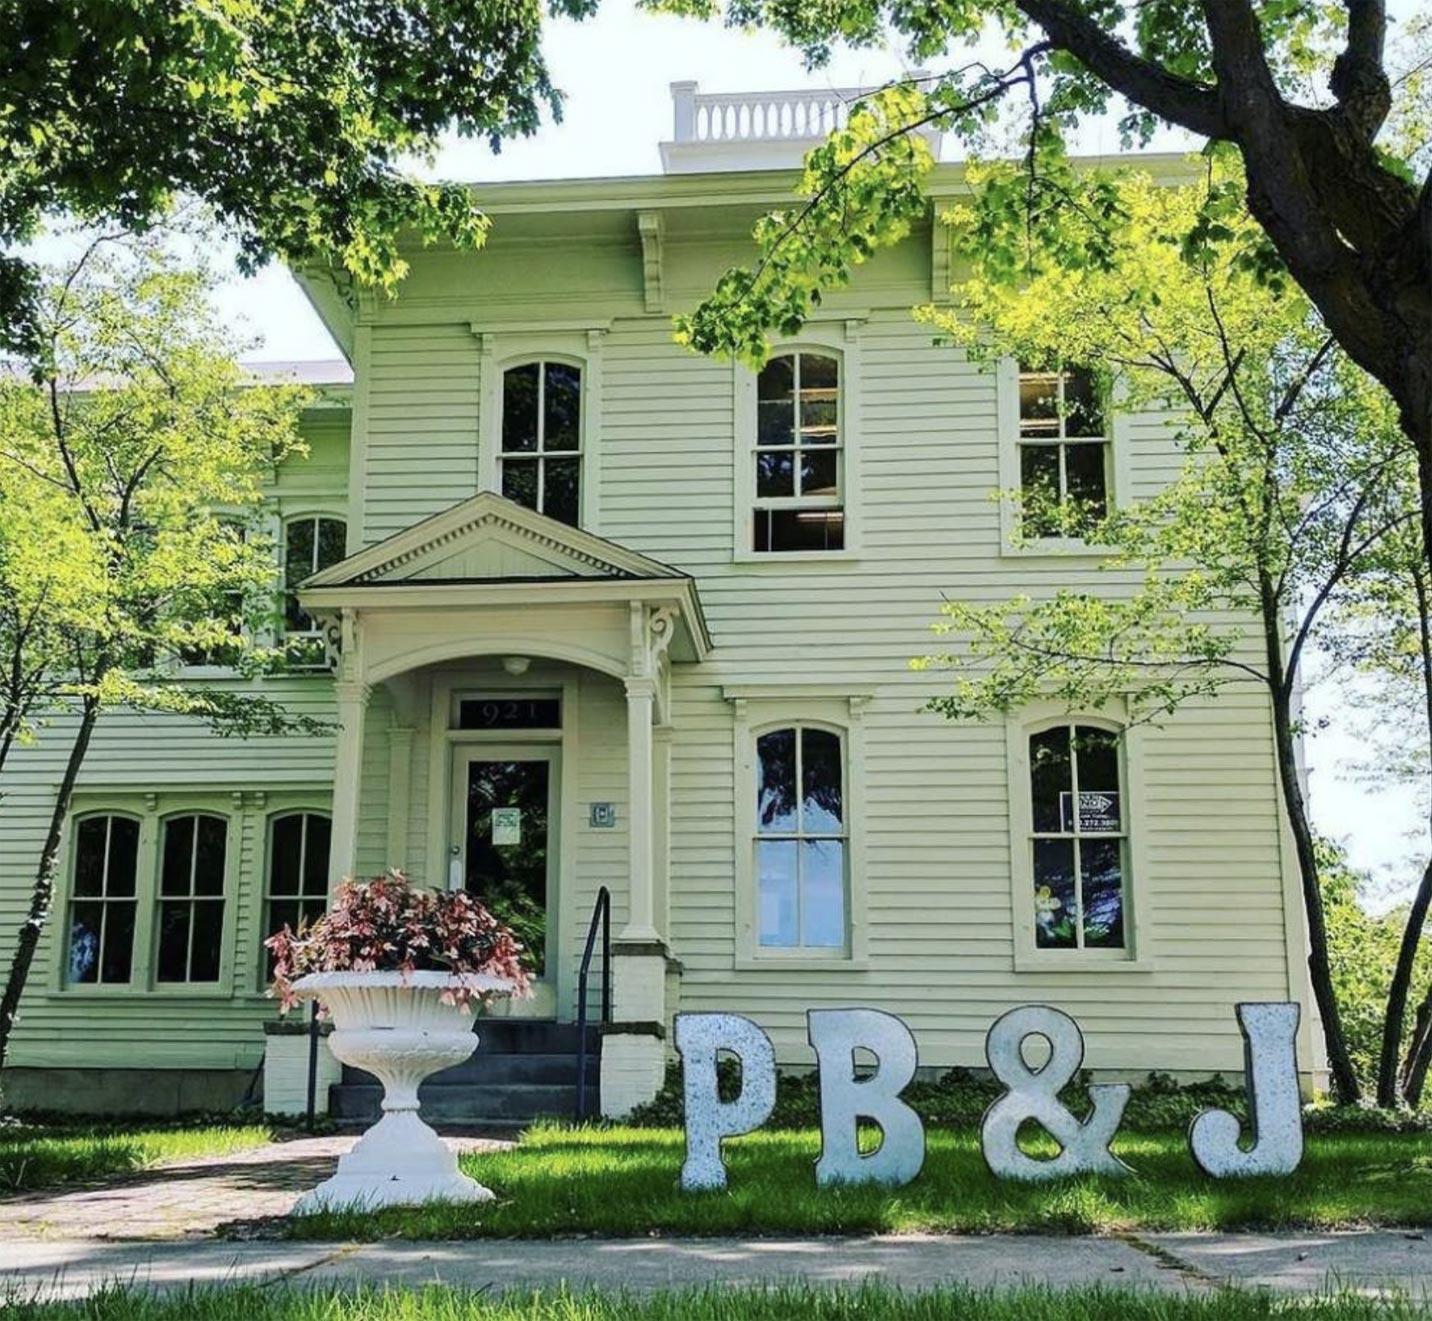 PB&J Office Exterior